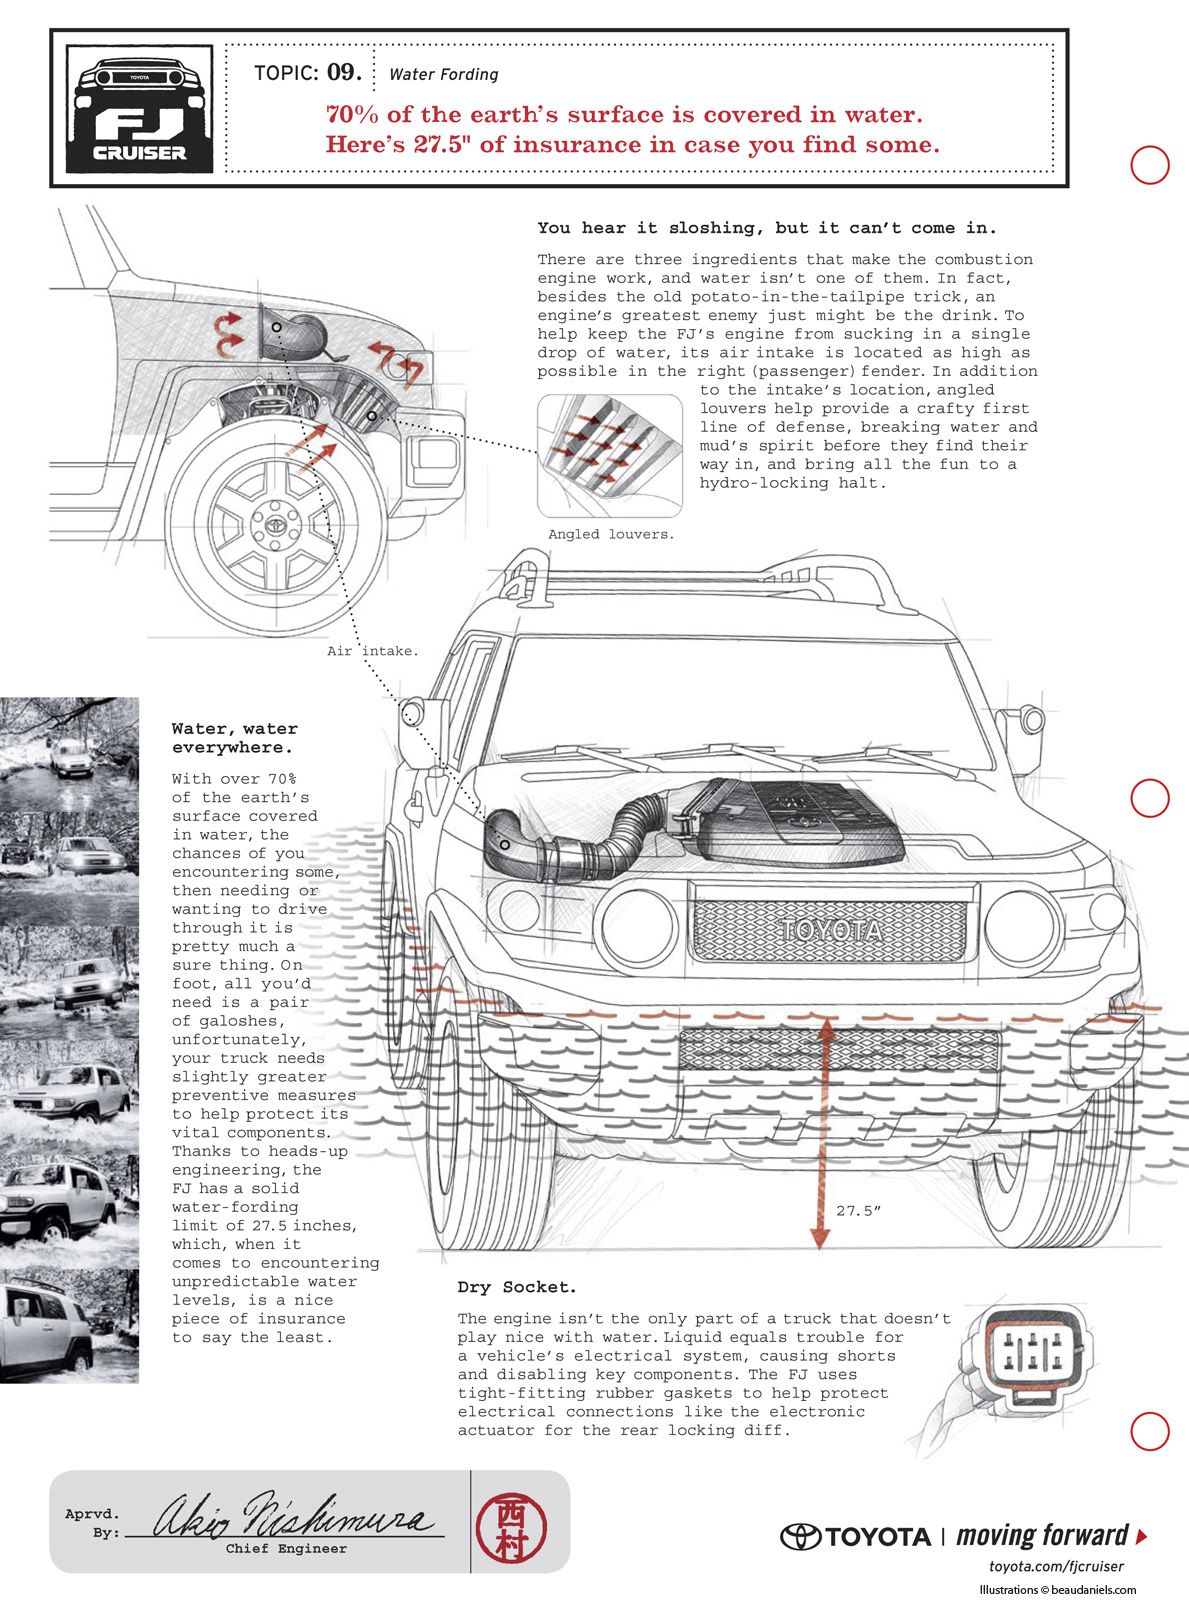 fj cruiser motor diagram wiring diagram datasource 2011 toyota fj cruiser engine diagram [ 1189 x 1600 Pixel ]